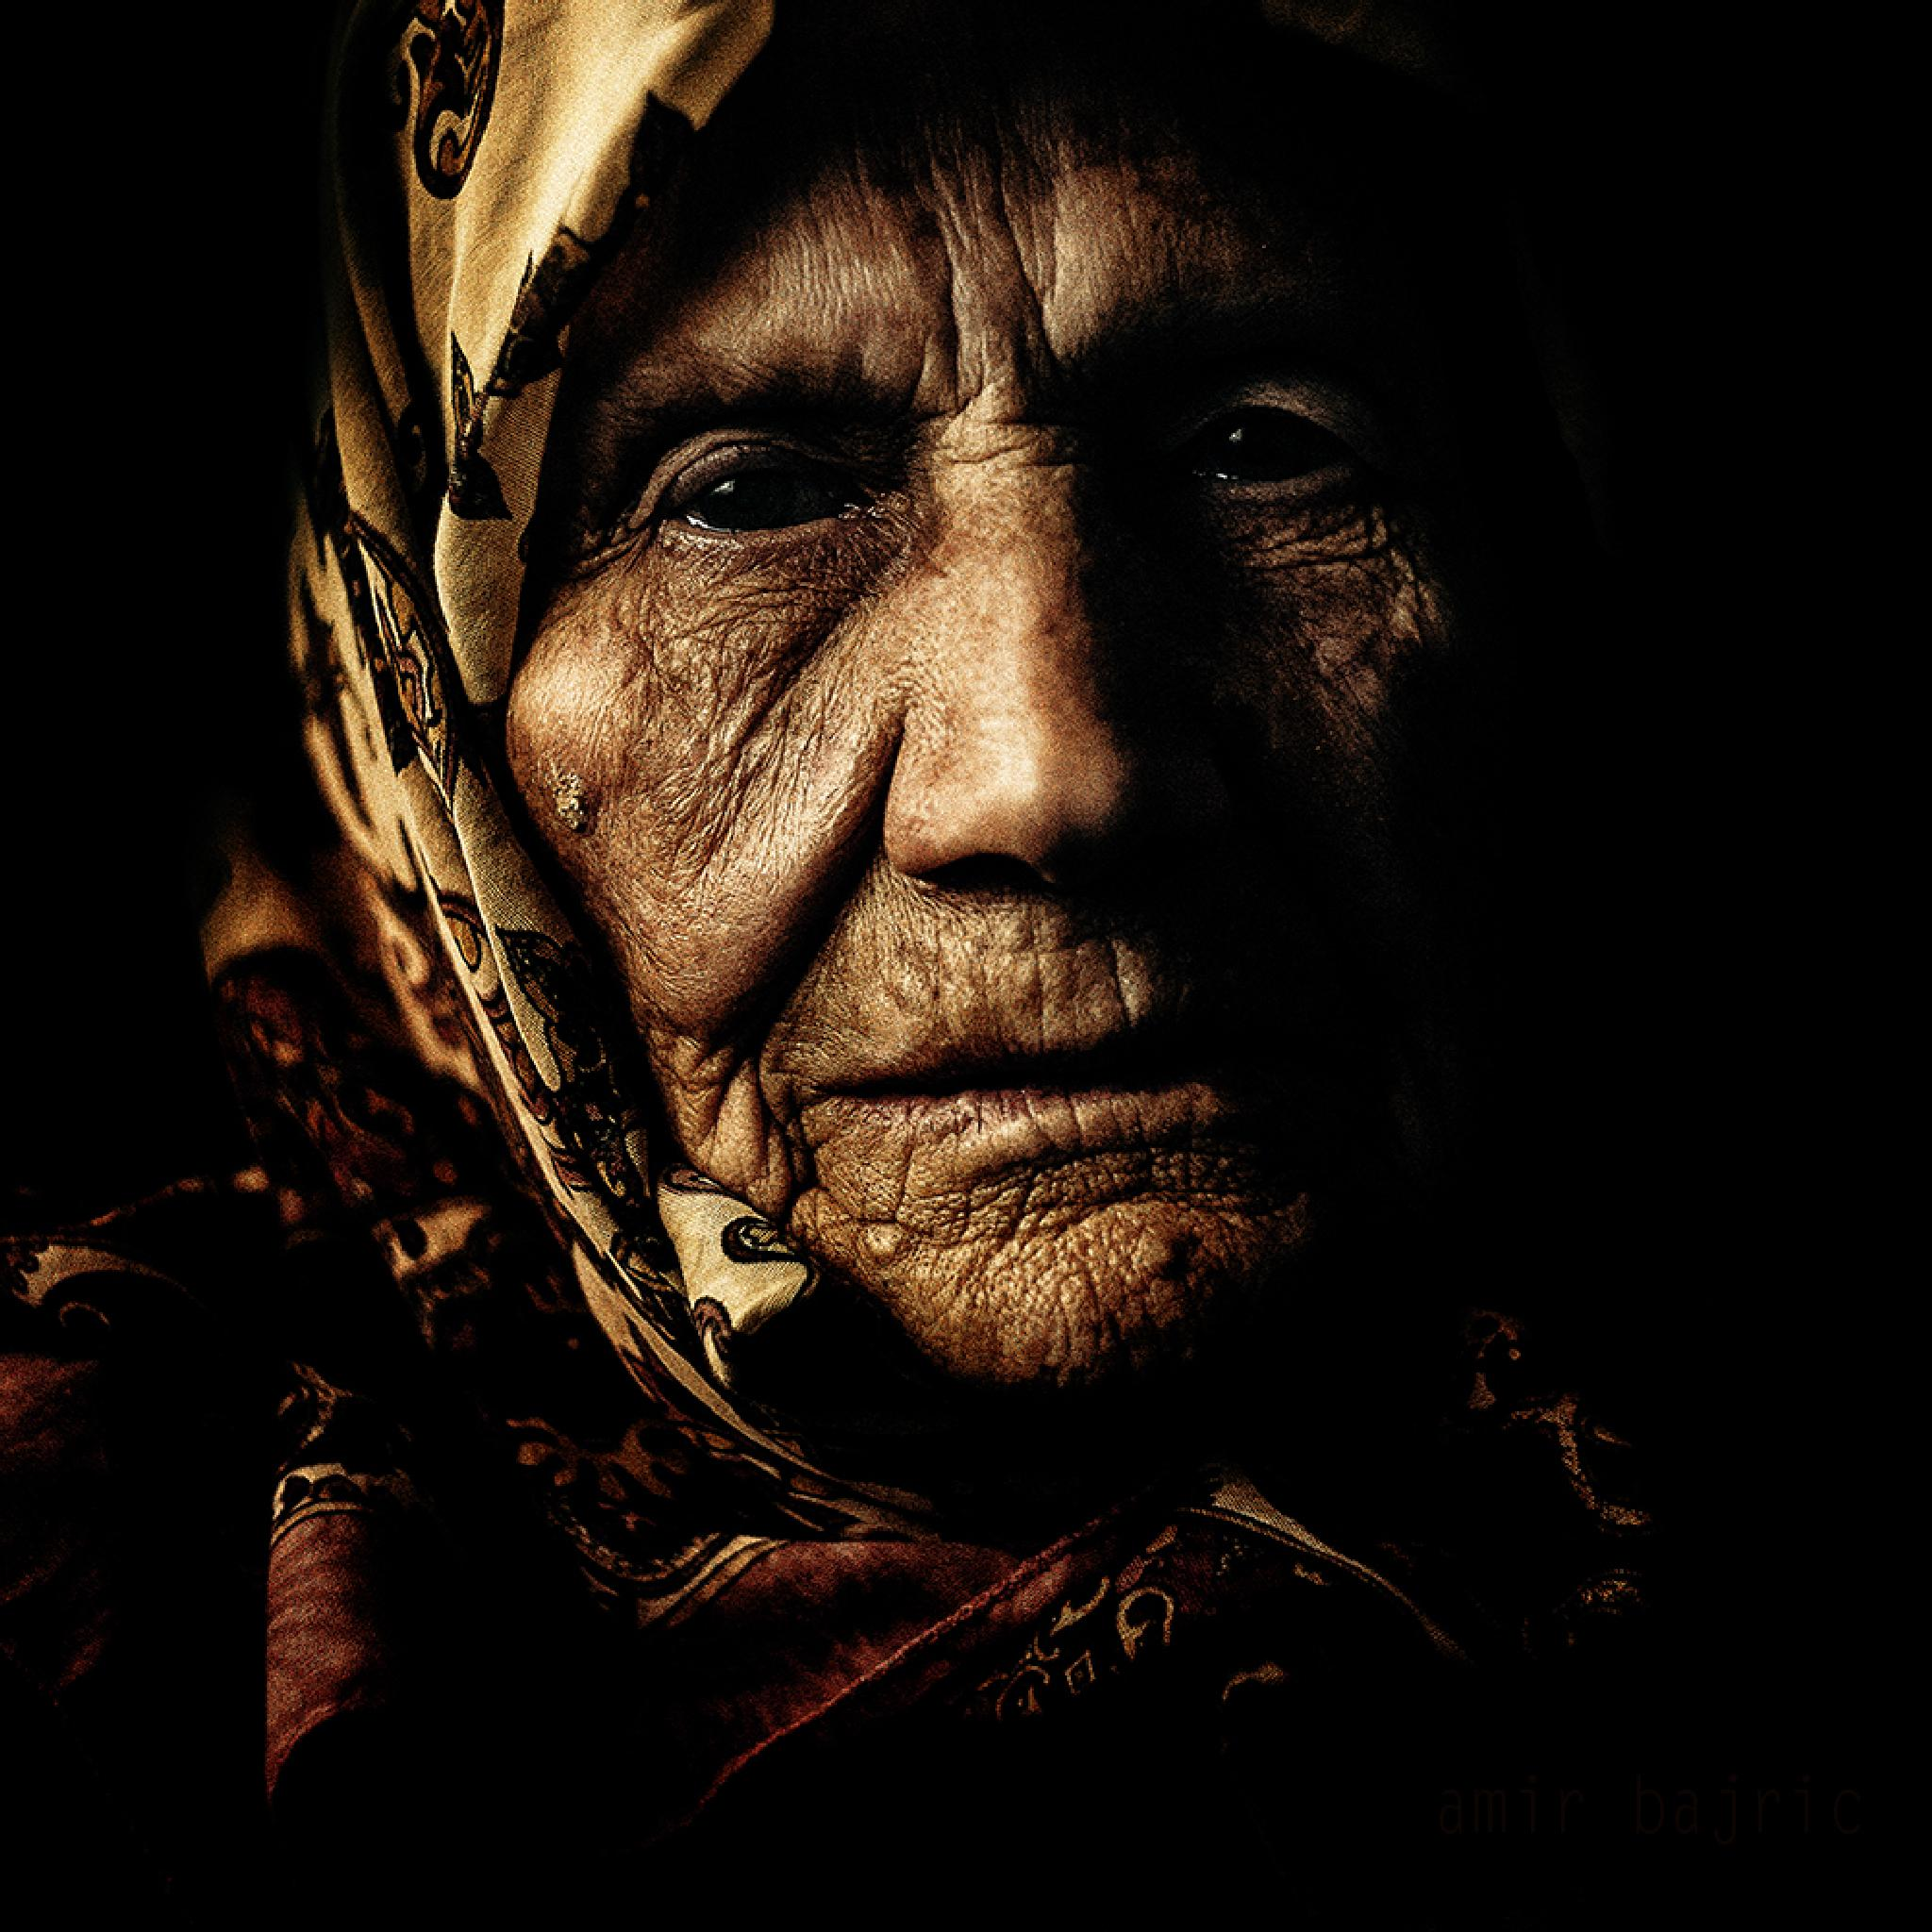 grandmother by Amir Bajrich